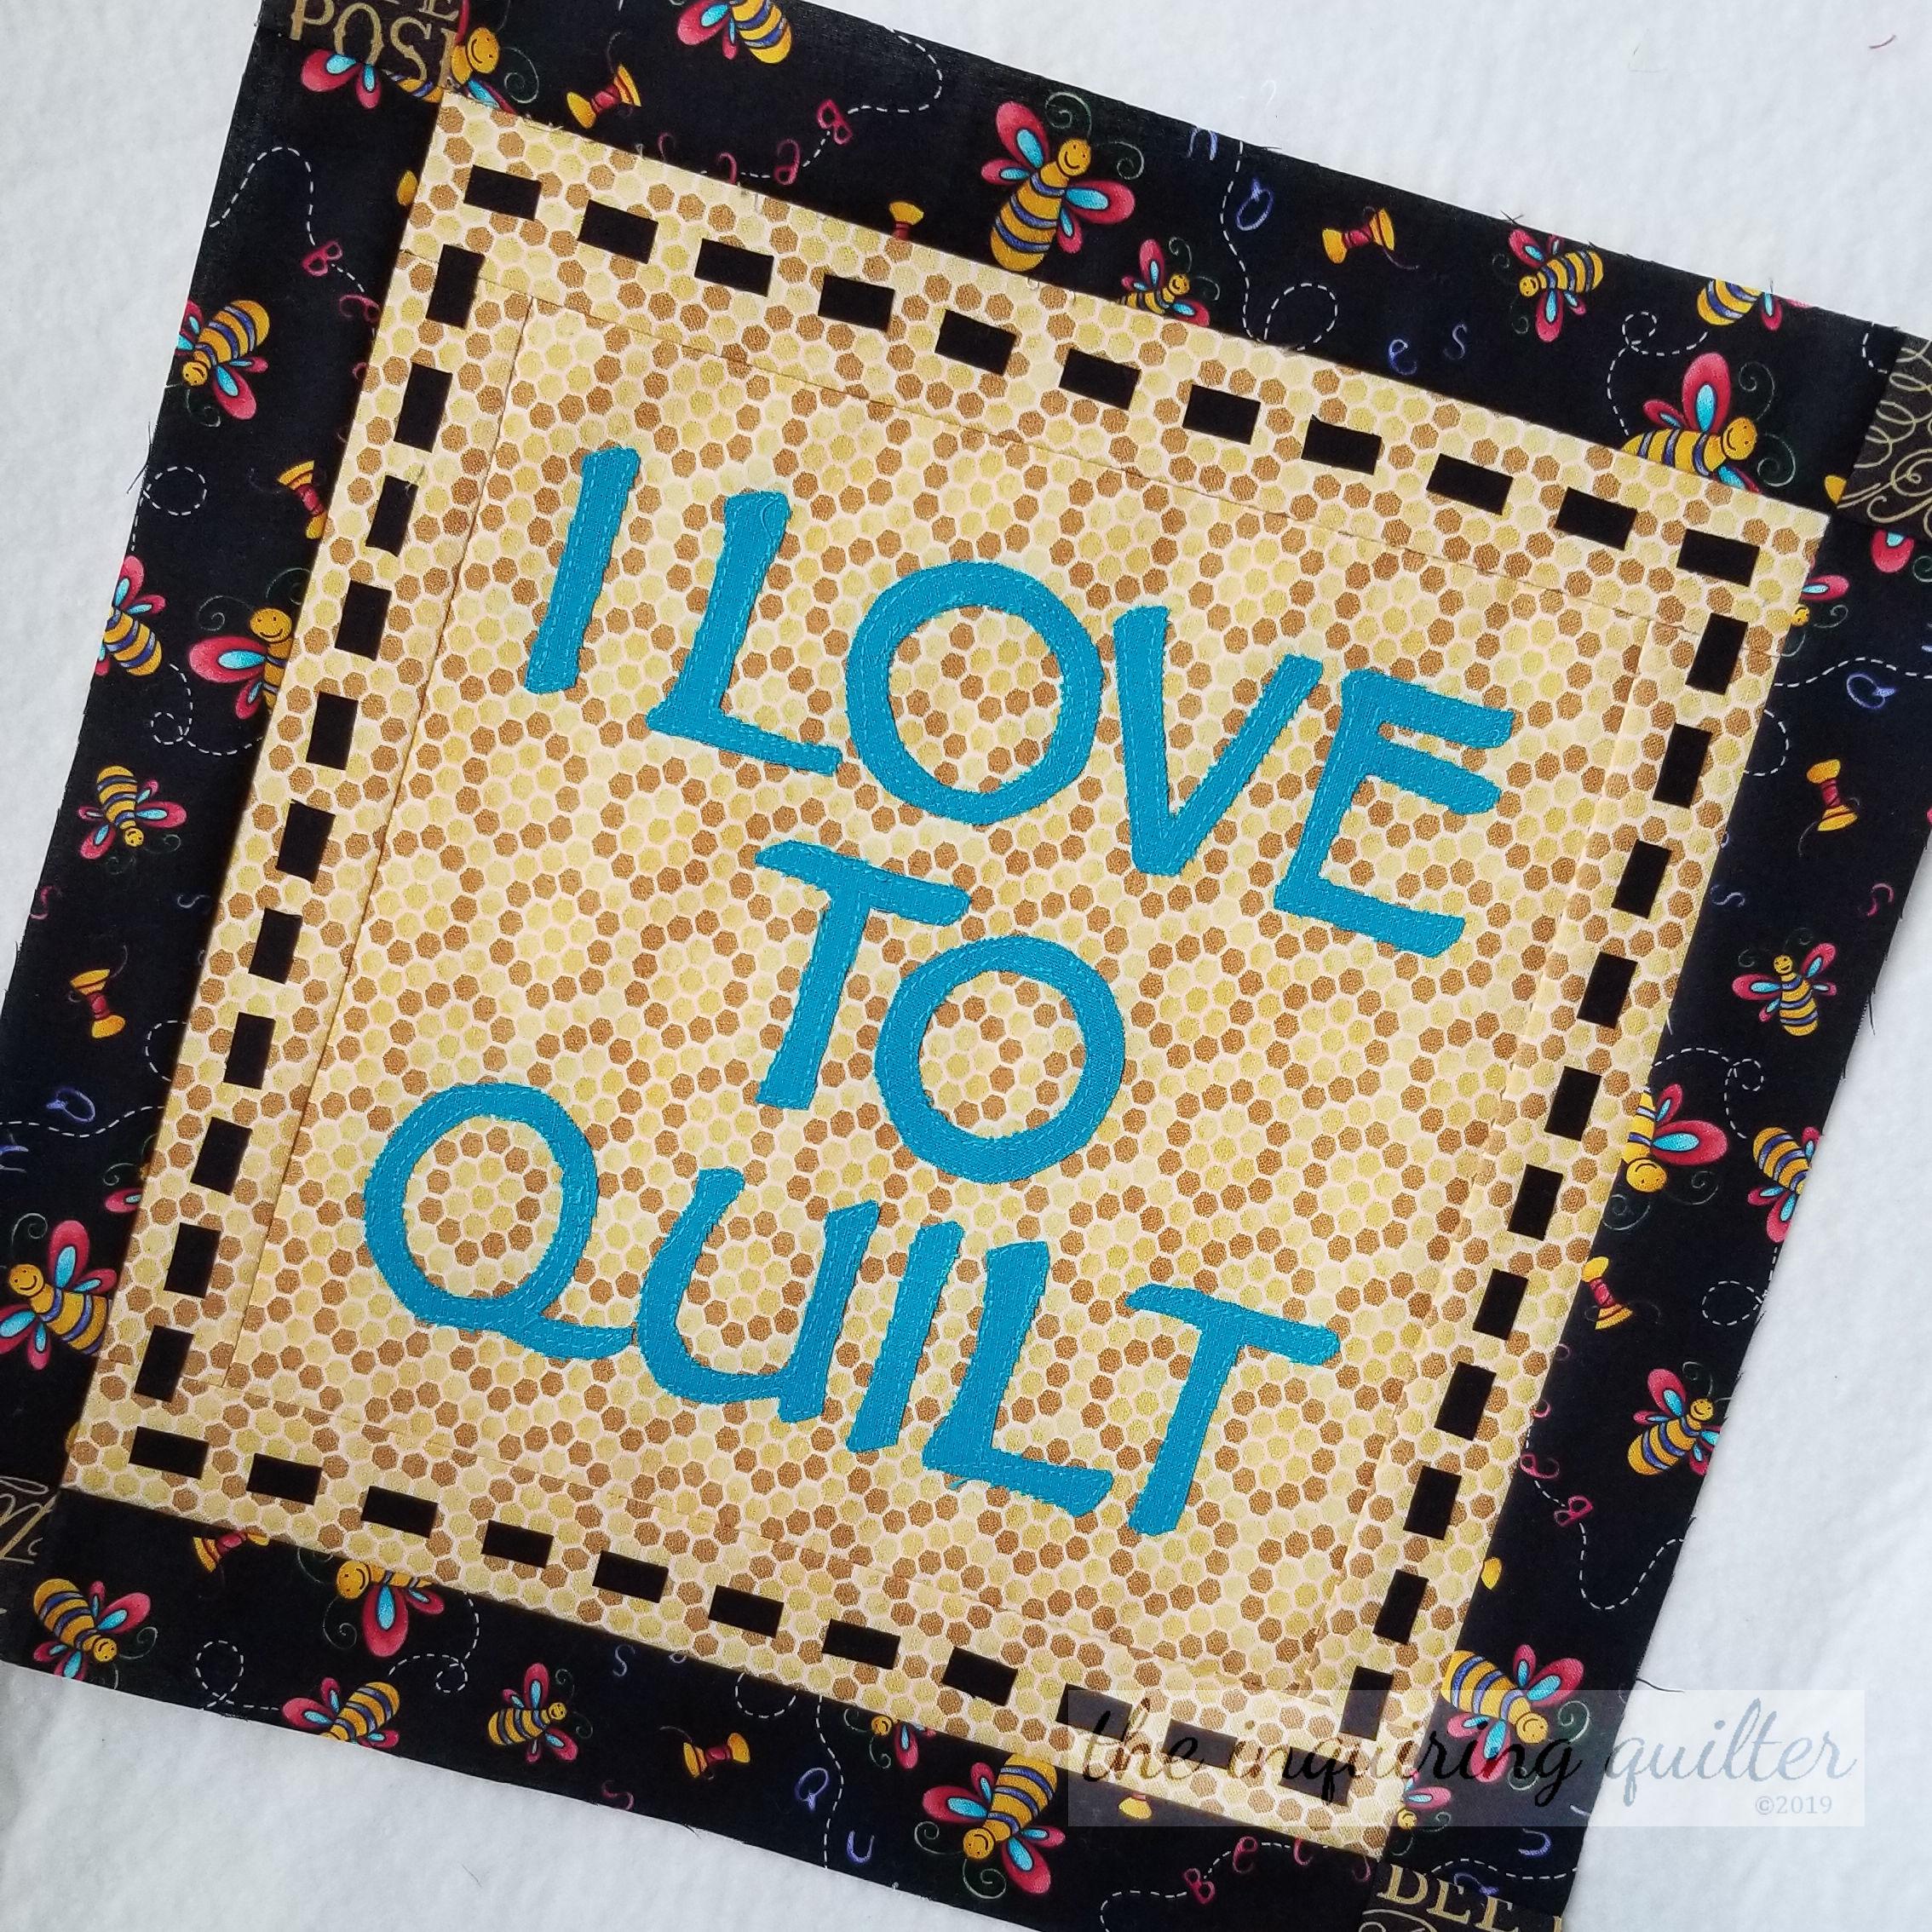 I Love to Quilt block 3.jpg